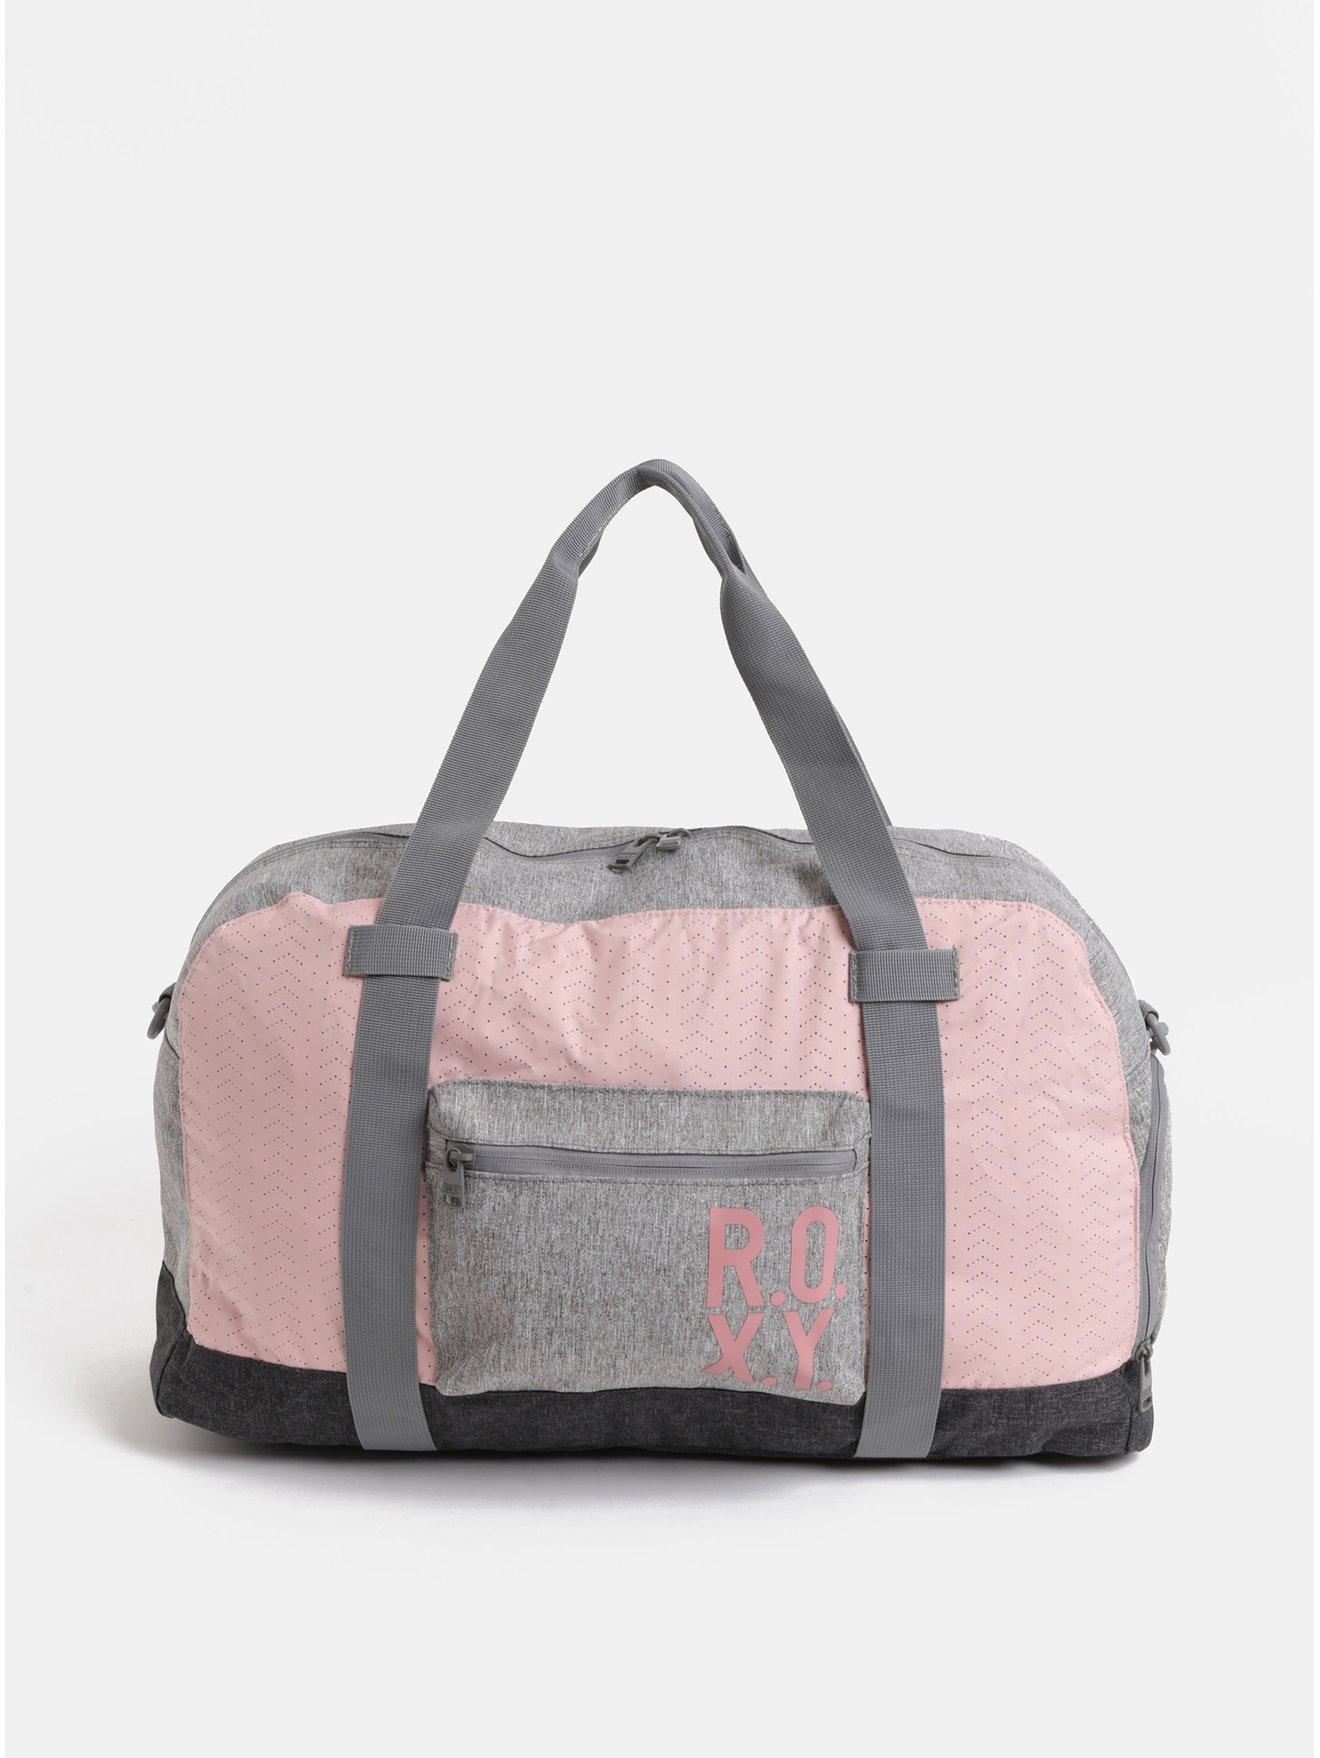 Růžovo-šedá dámská sportovní taška Roxy Winter Come 32 l